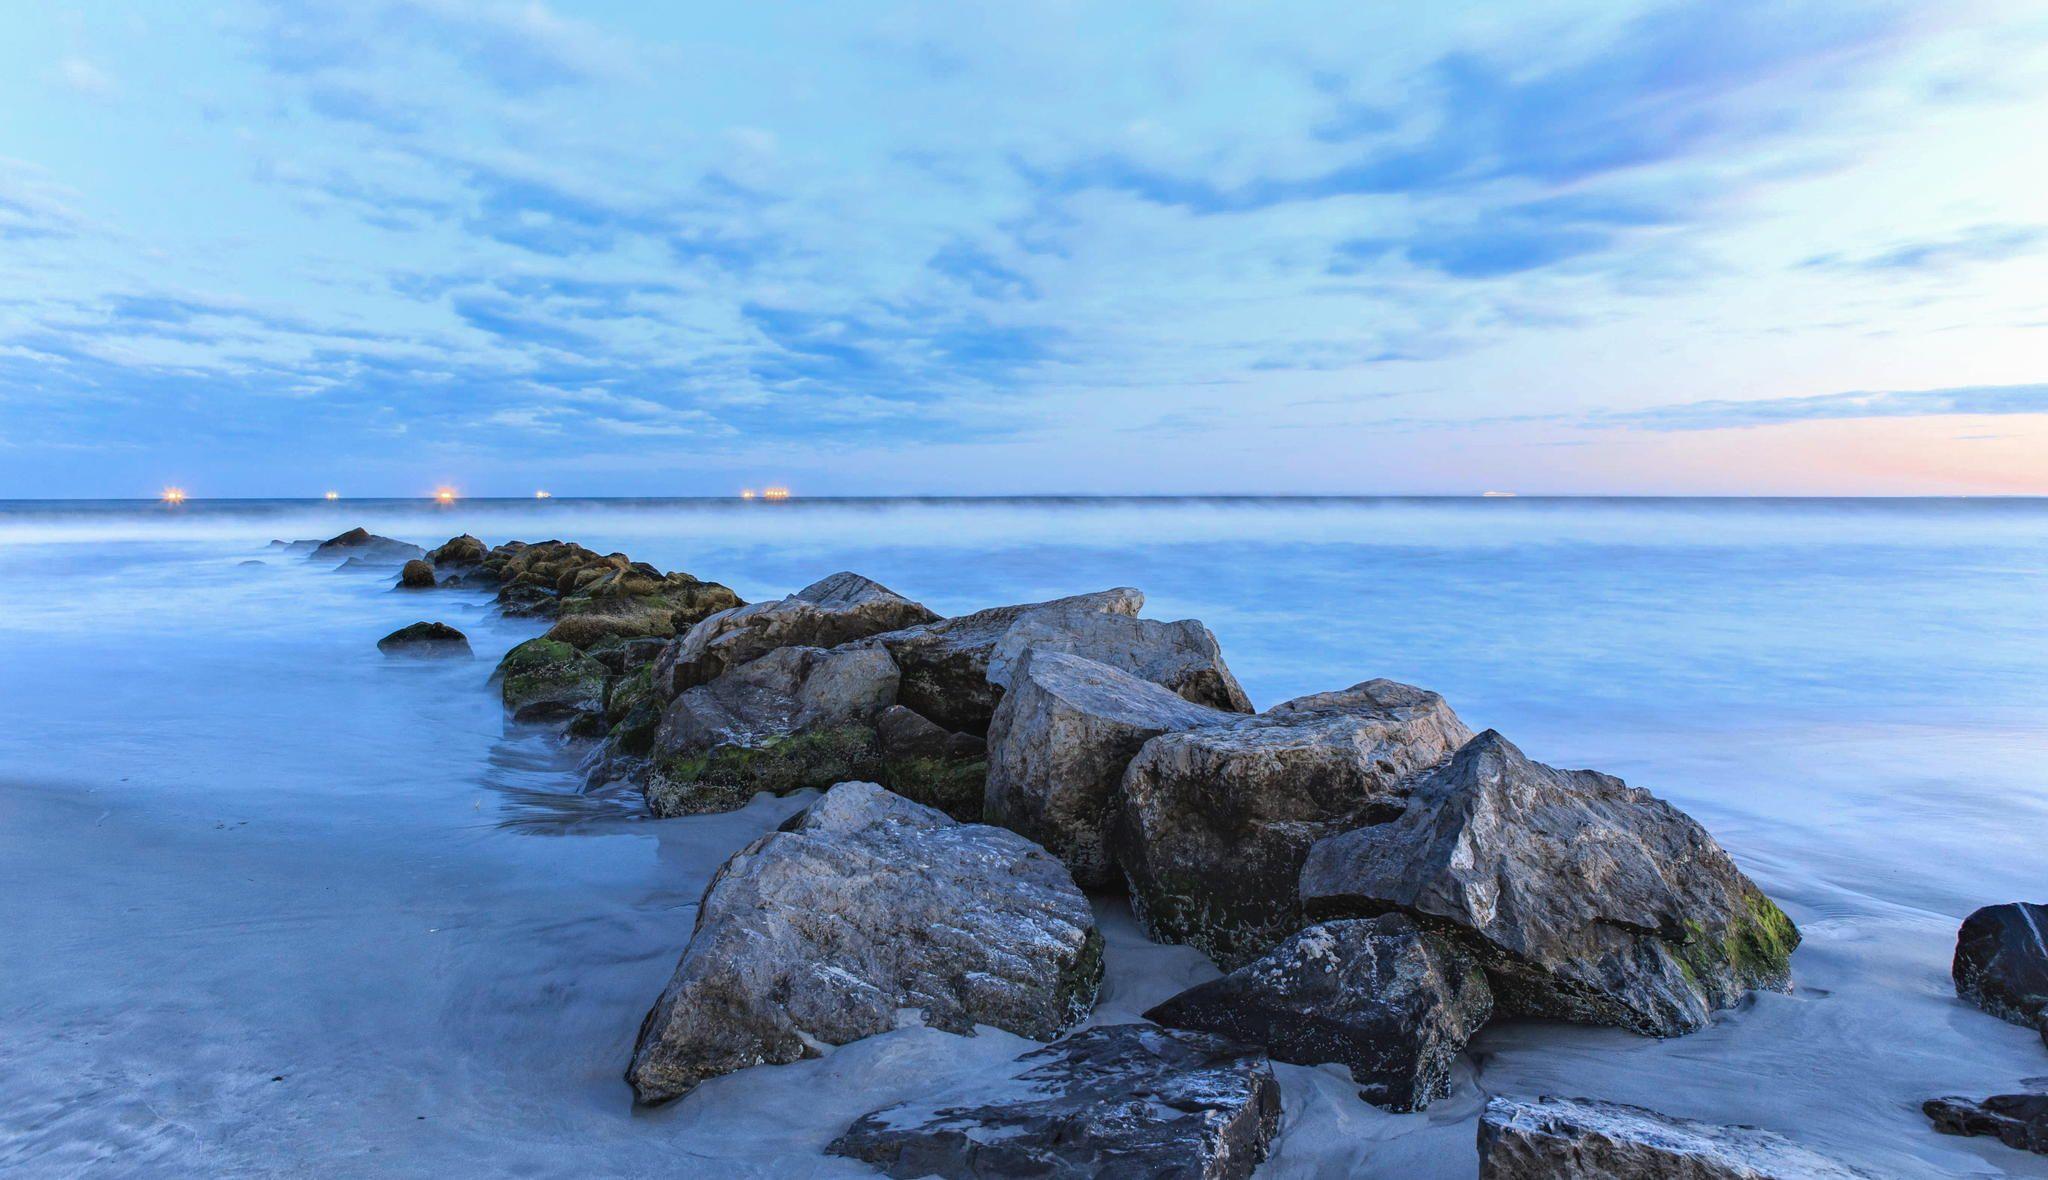 LONG BEACH by Oleg Kotelskiy on 500px